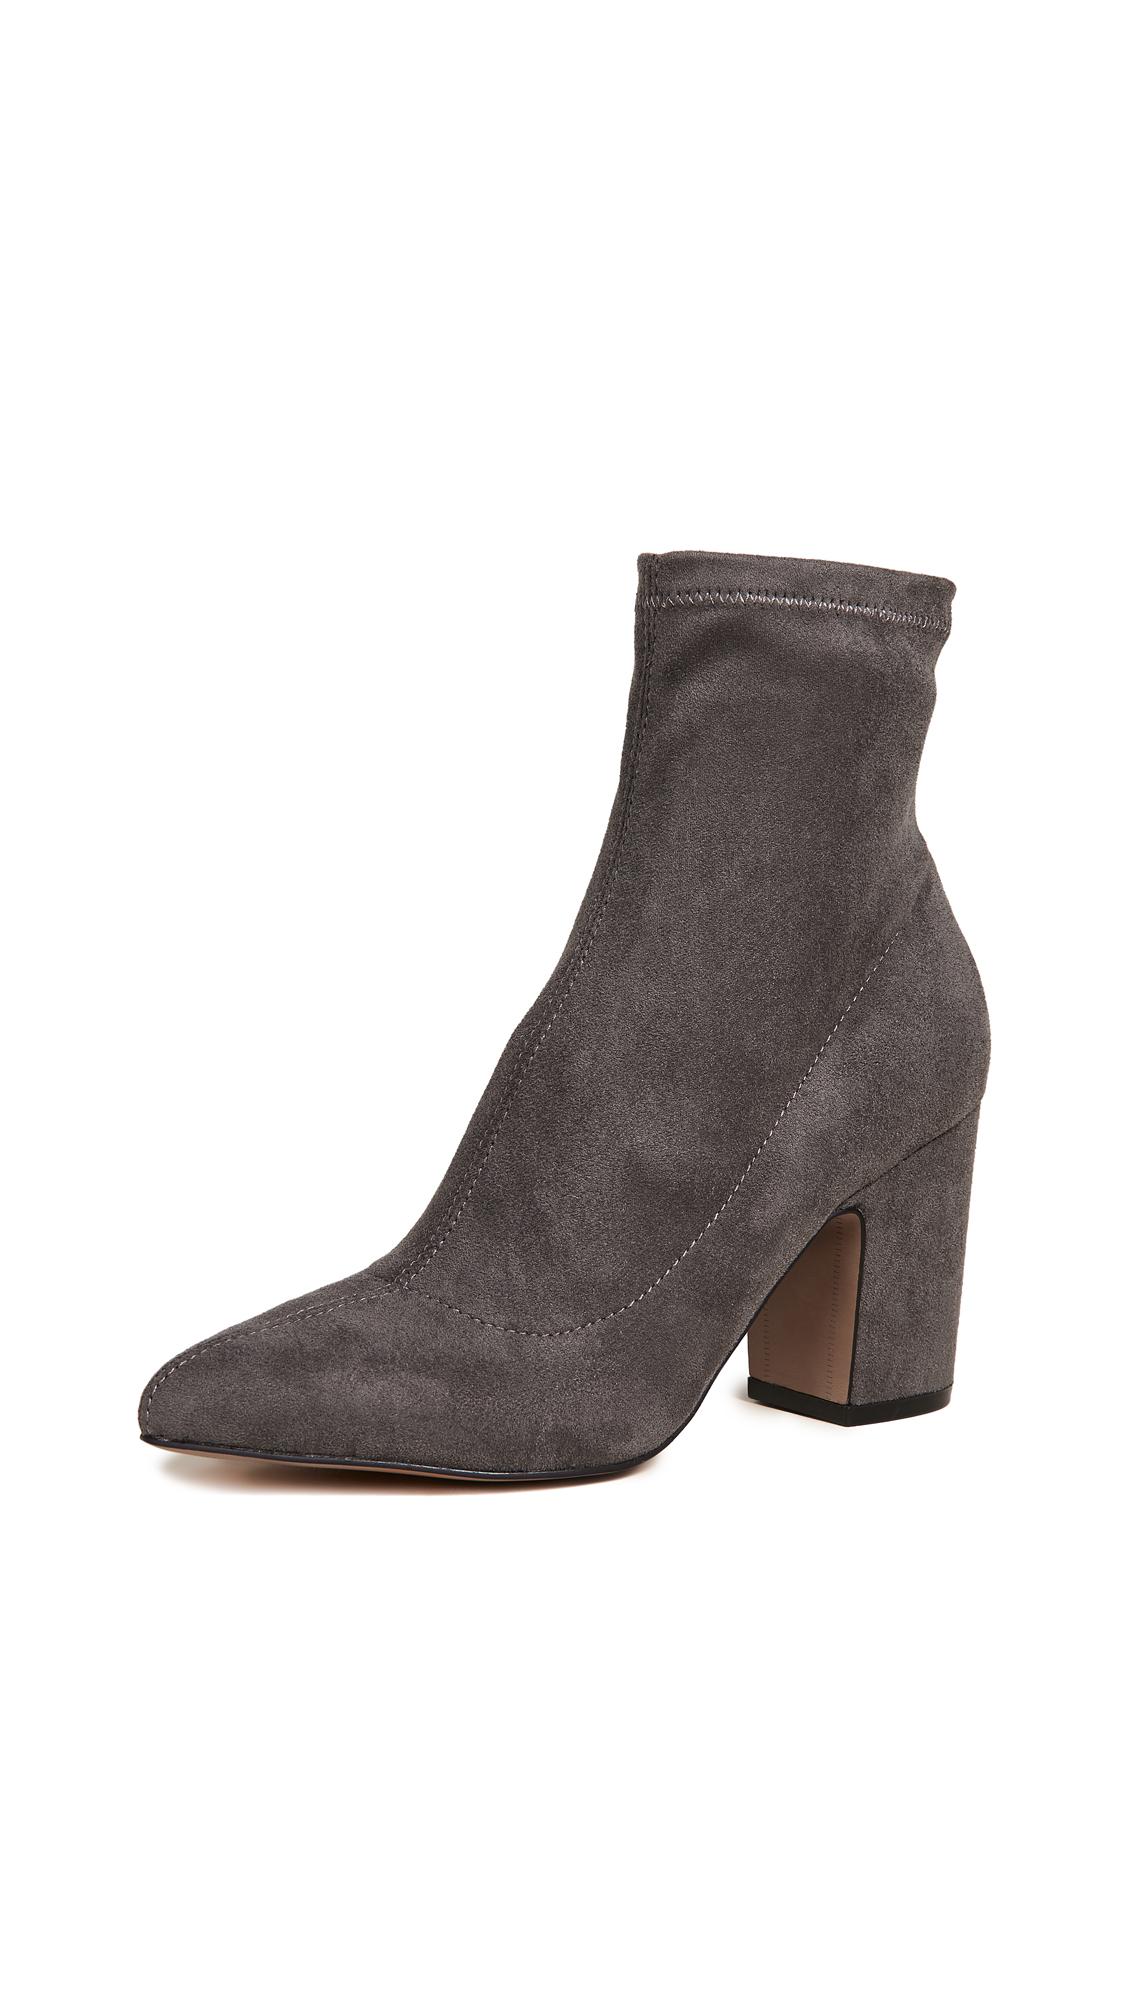 Steven Leandra Block Heel Ankle Booties - Grey